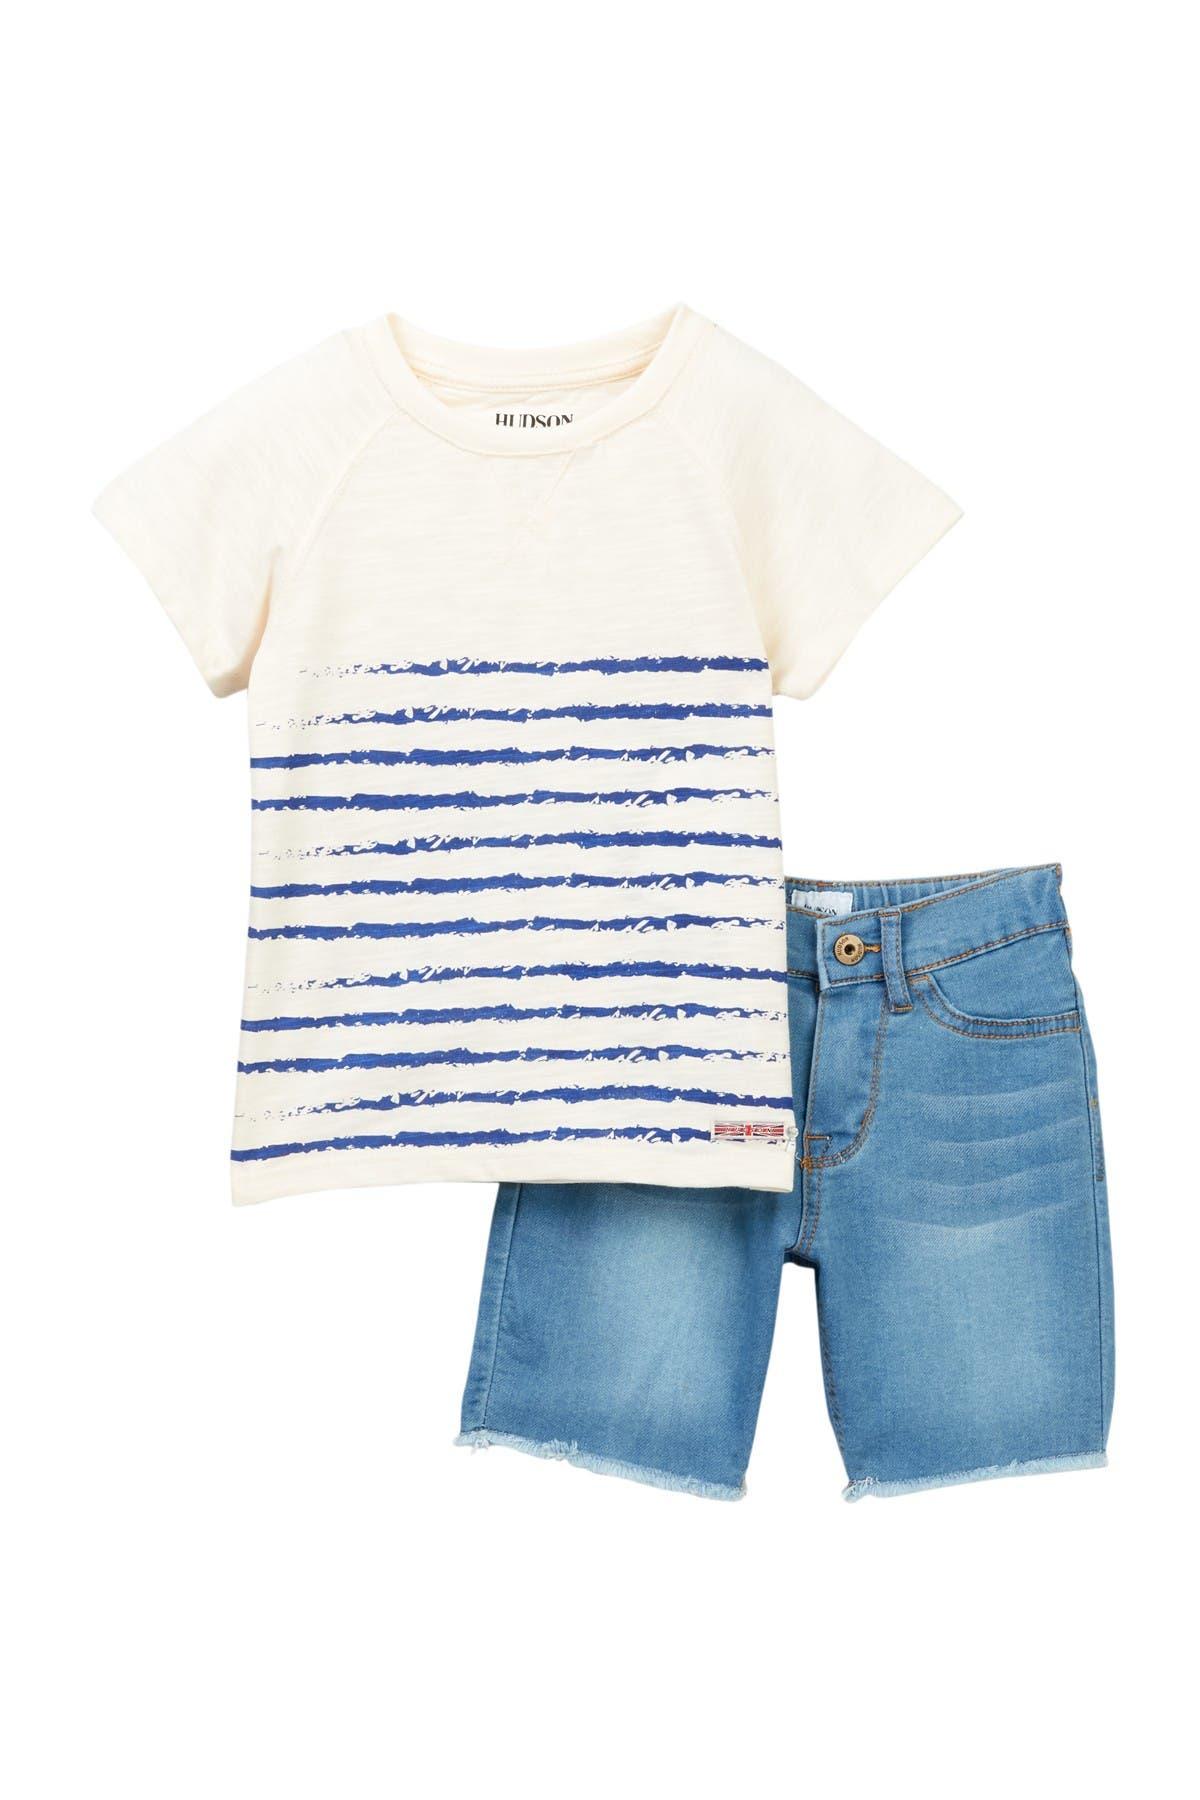 Image of HUDSON Jeans Printed Slub Jersey & Denim Shorts Set